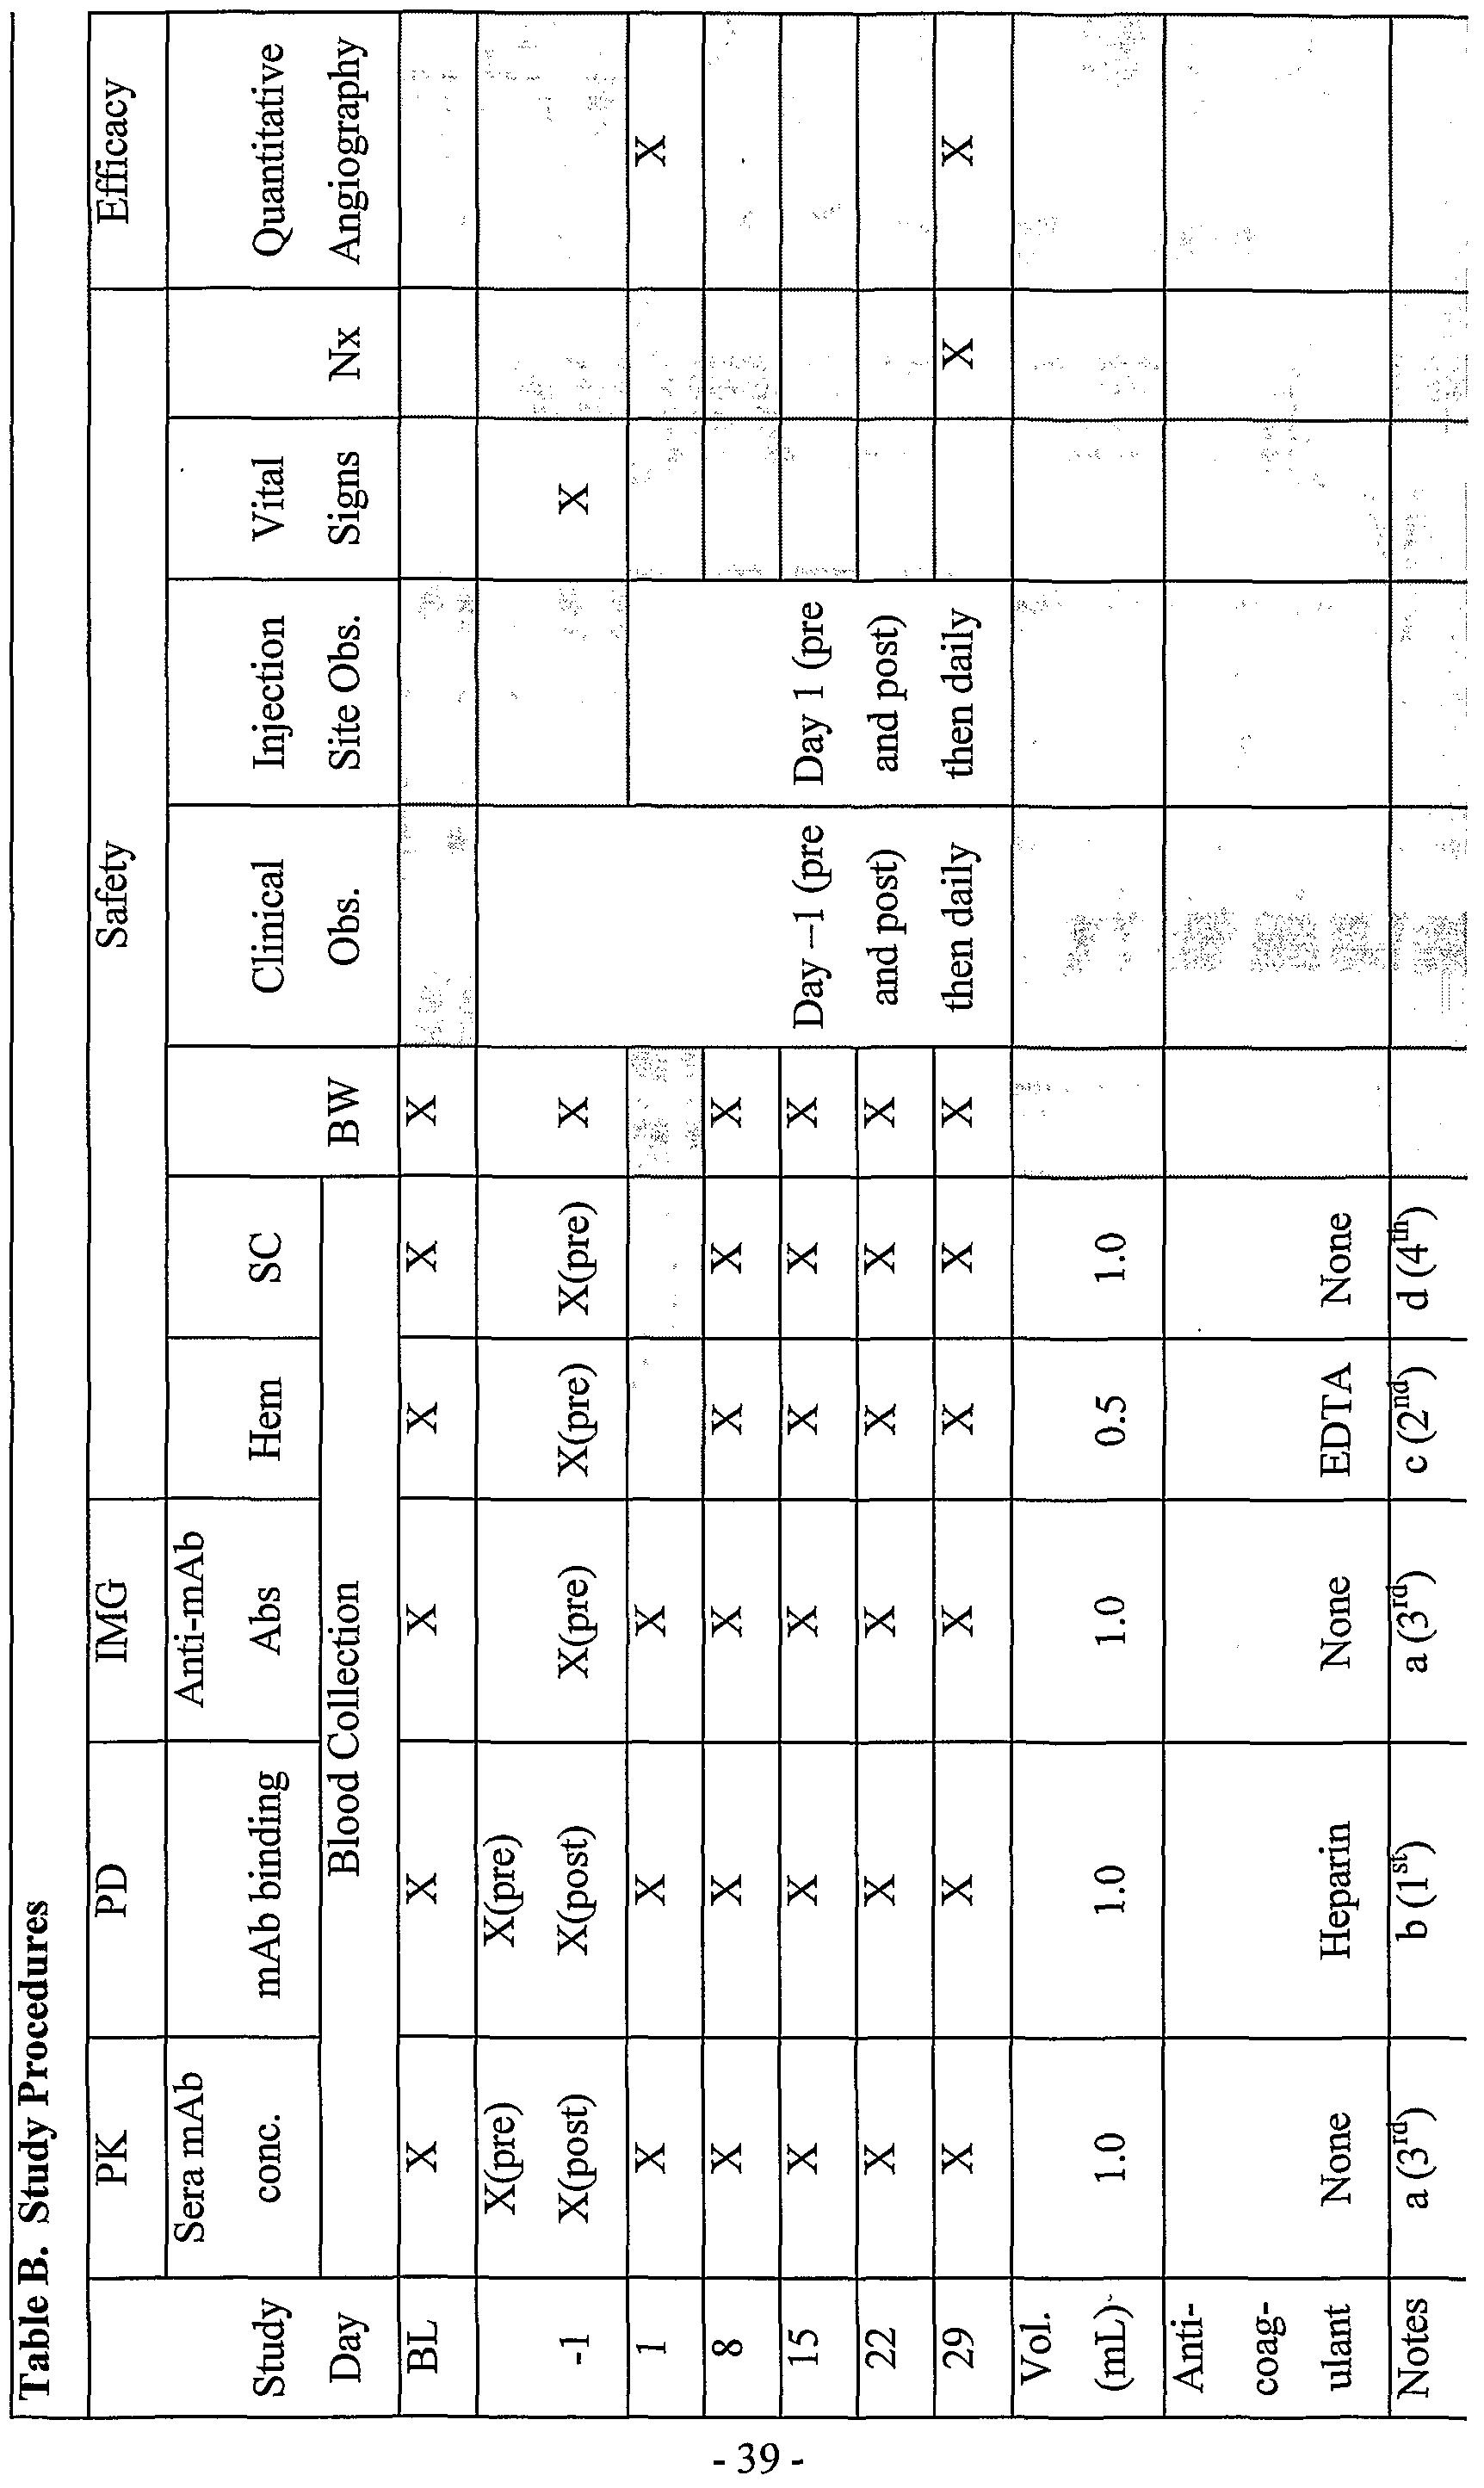 WO2001070260A1 - Cd18-binding antibodies inhibit stenosis